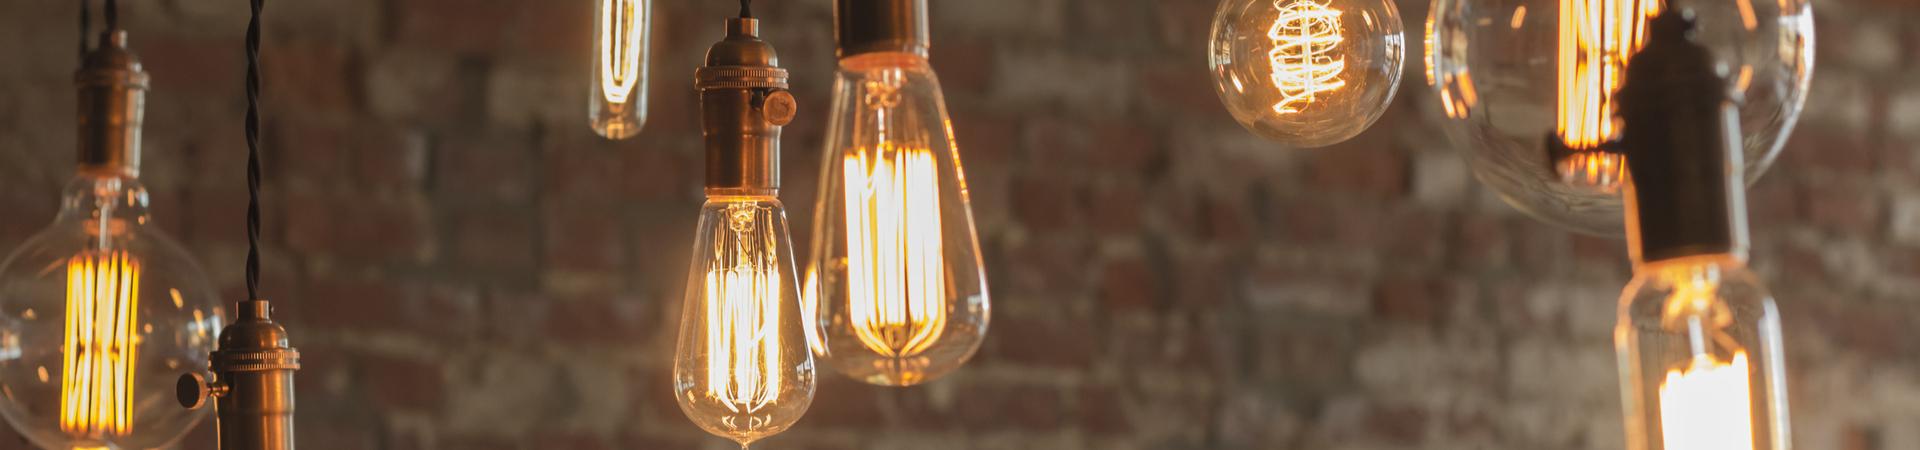 wiklick-ingrosso-illuminazione-led-bergamo.jpg